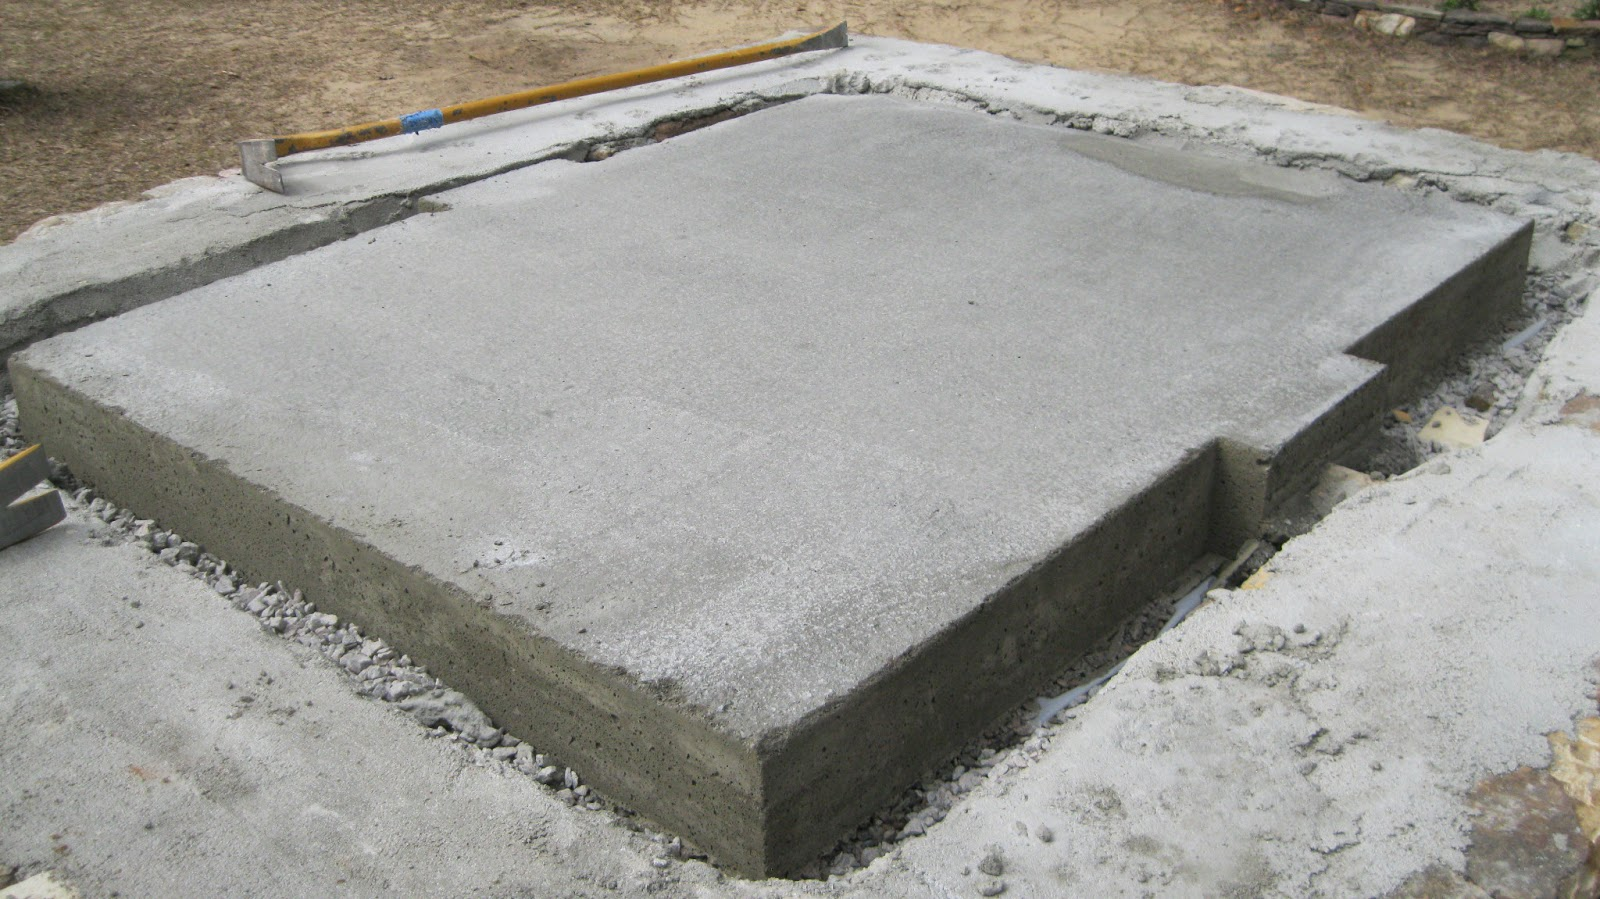 Structural Concrete Slabs : Wood oven update… structural slab